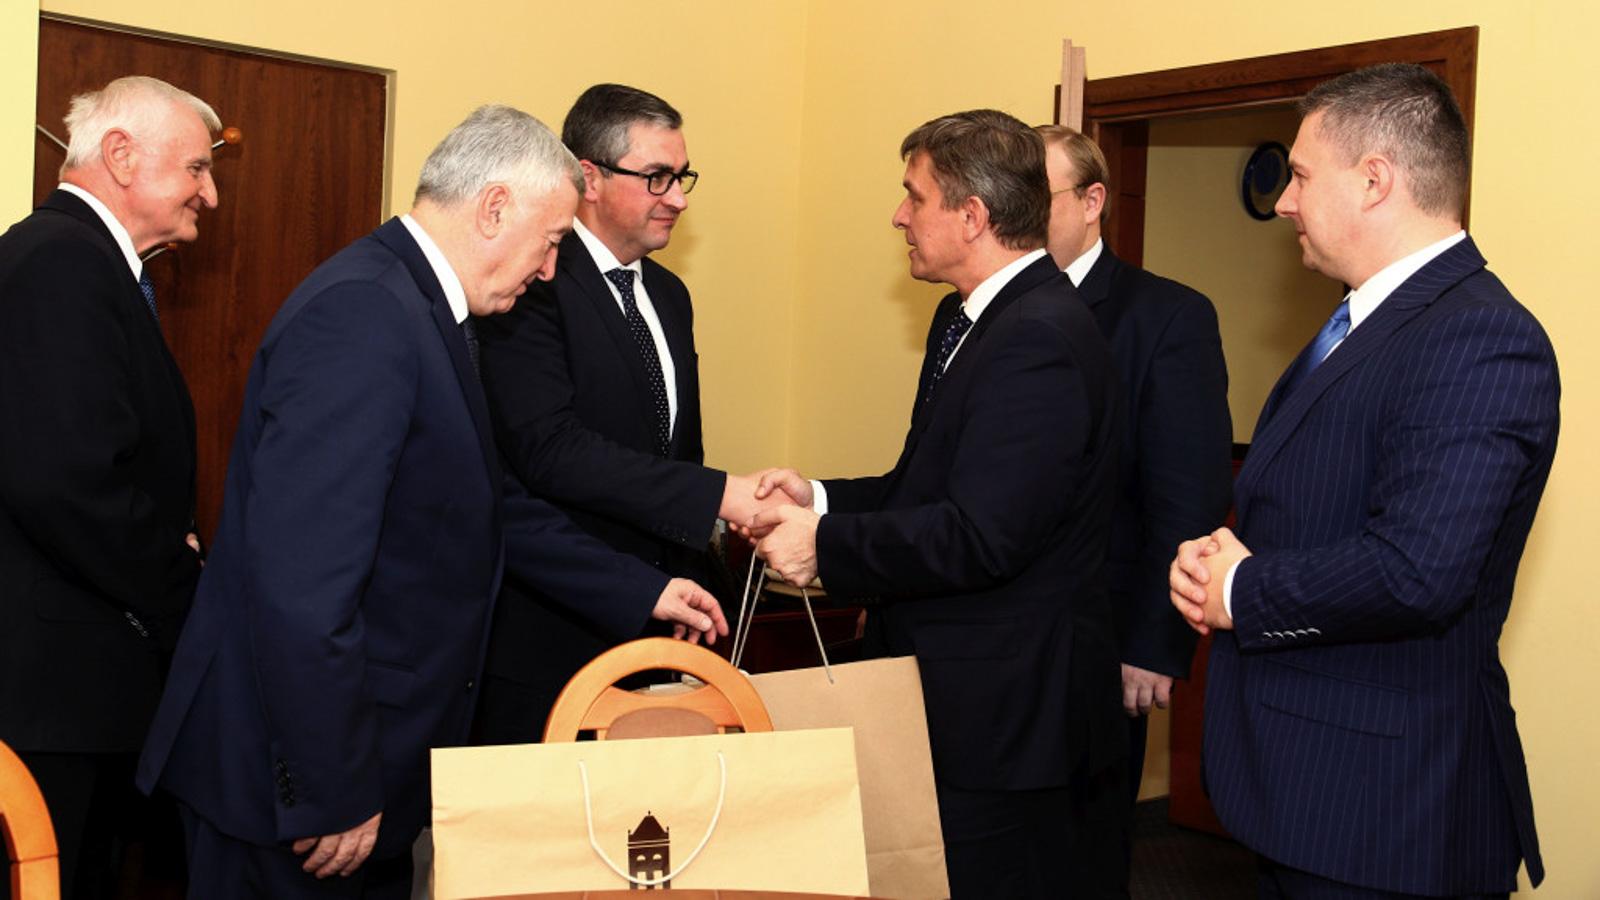 Wizyta-delegacji-z-Ukrainy-5-1024x683